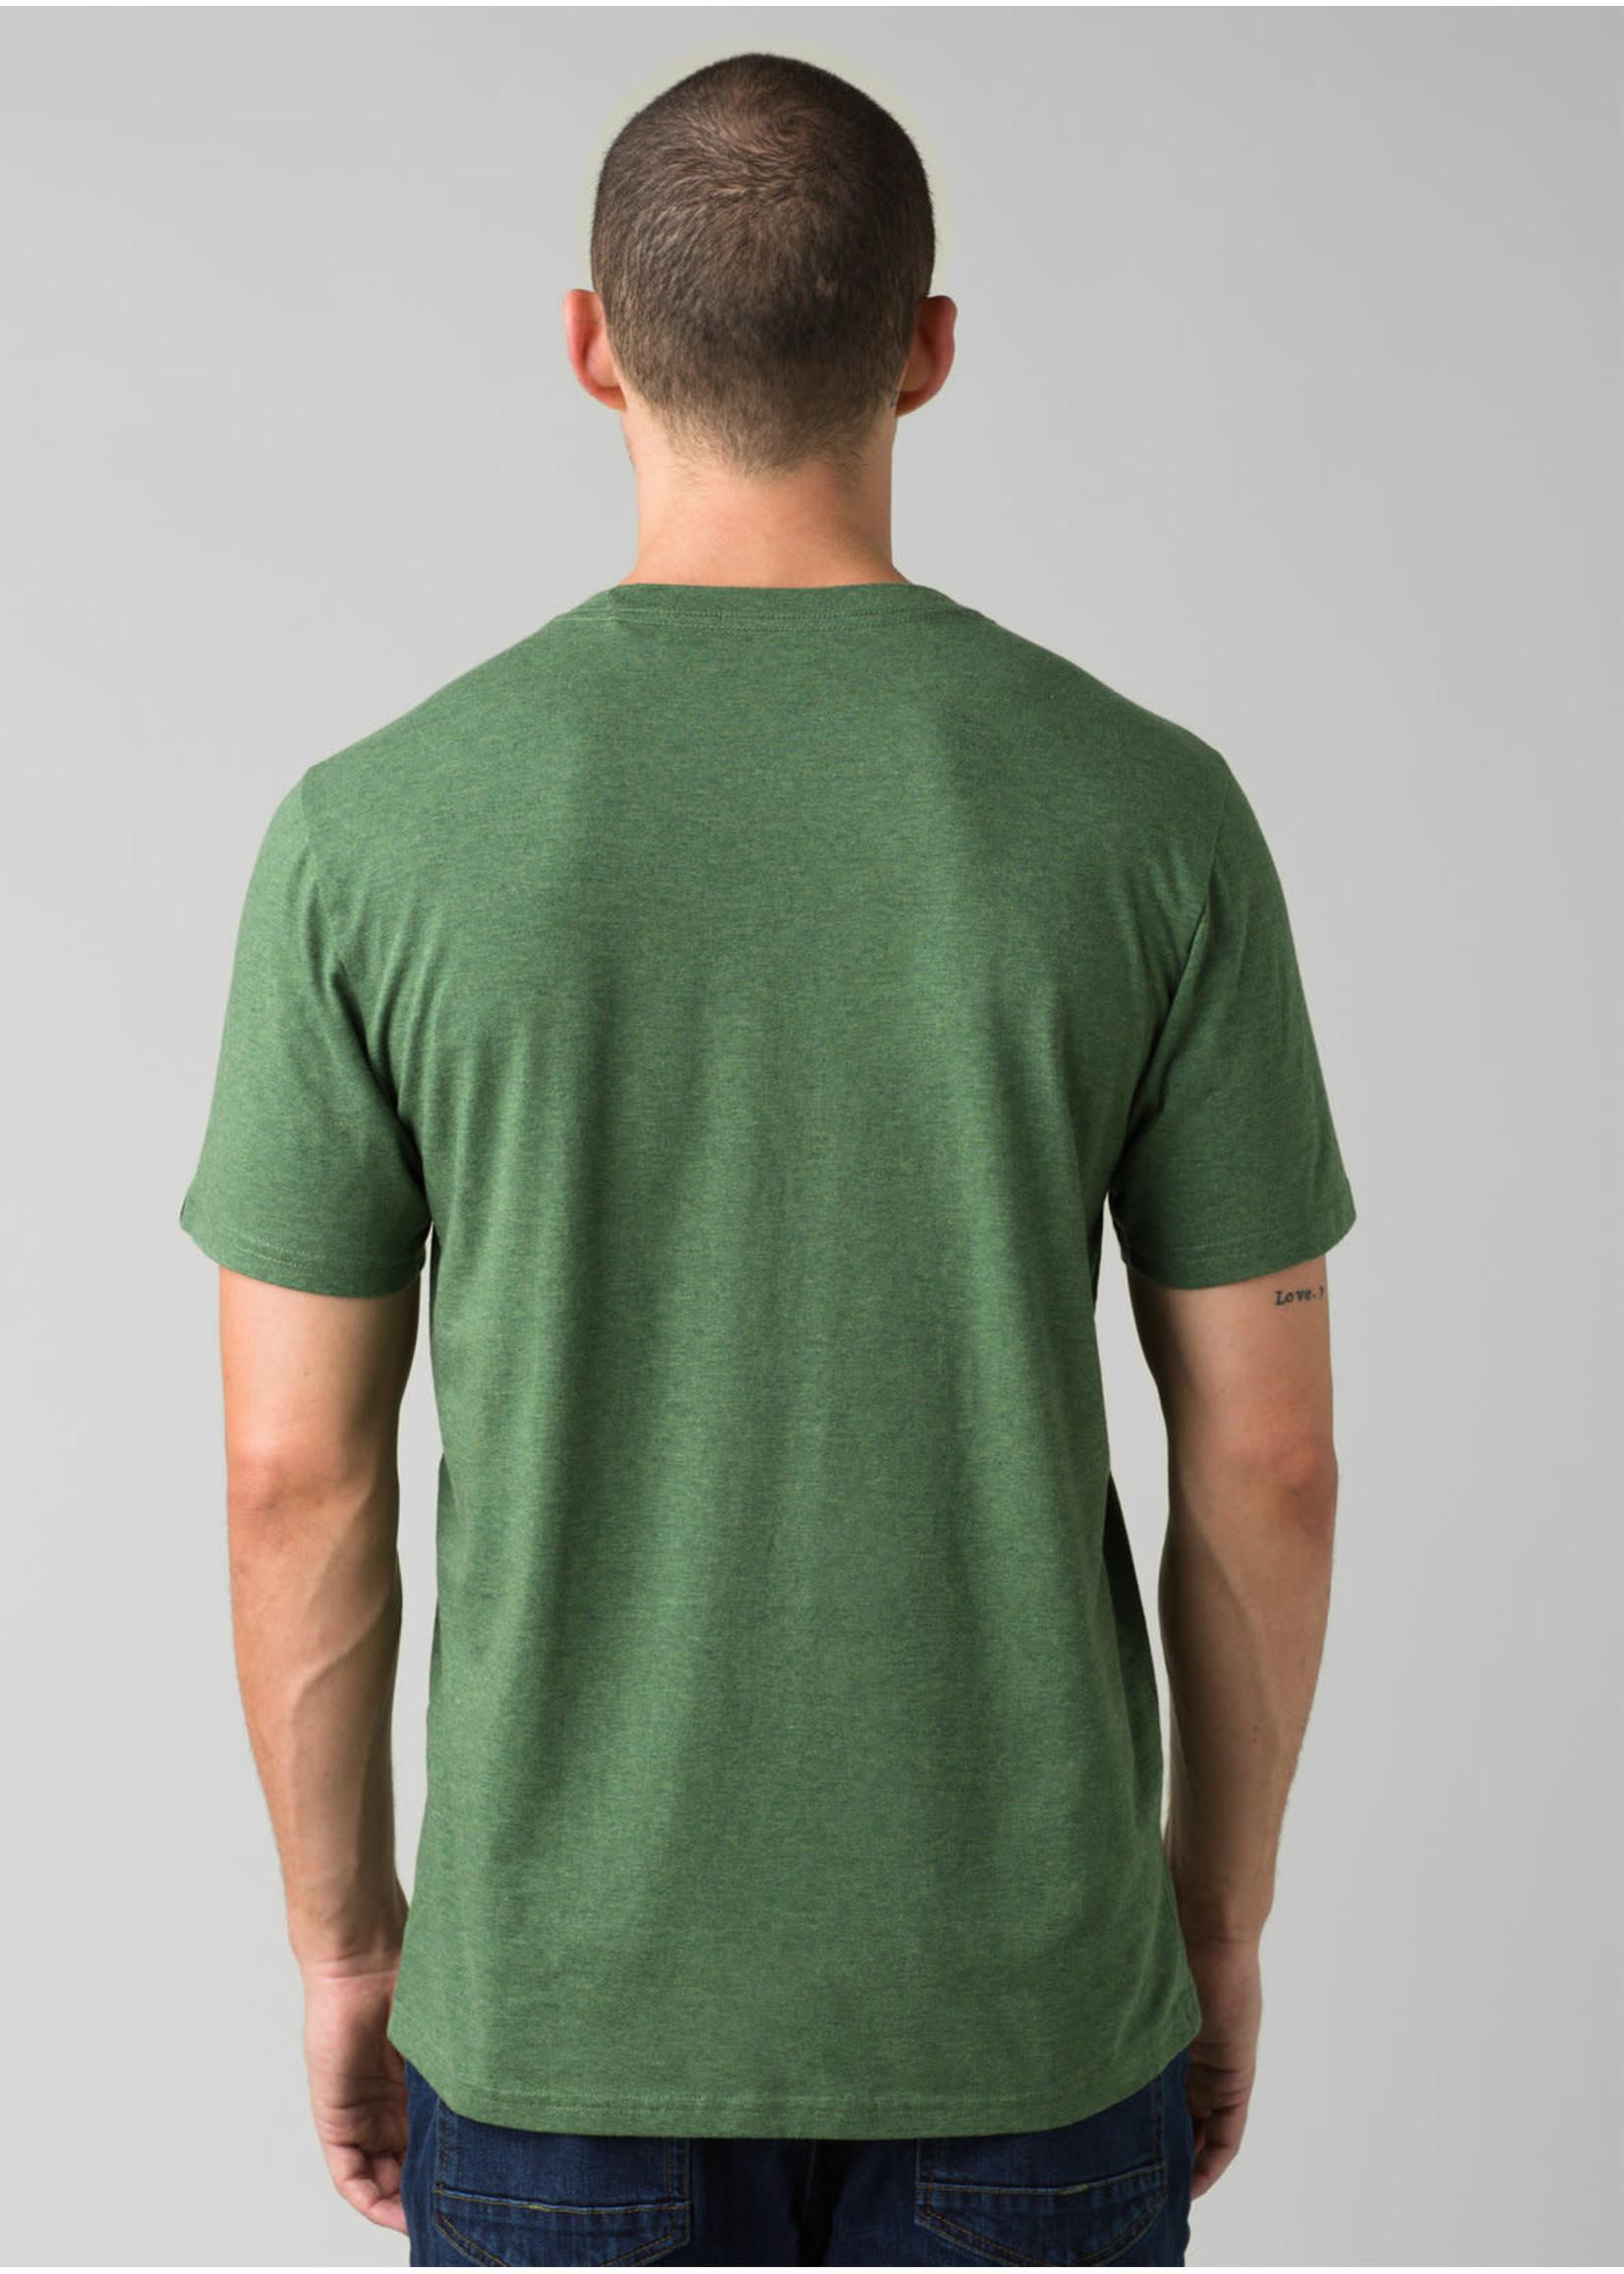 PRANA T-shirt Will Travel Journeyman